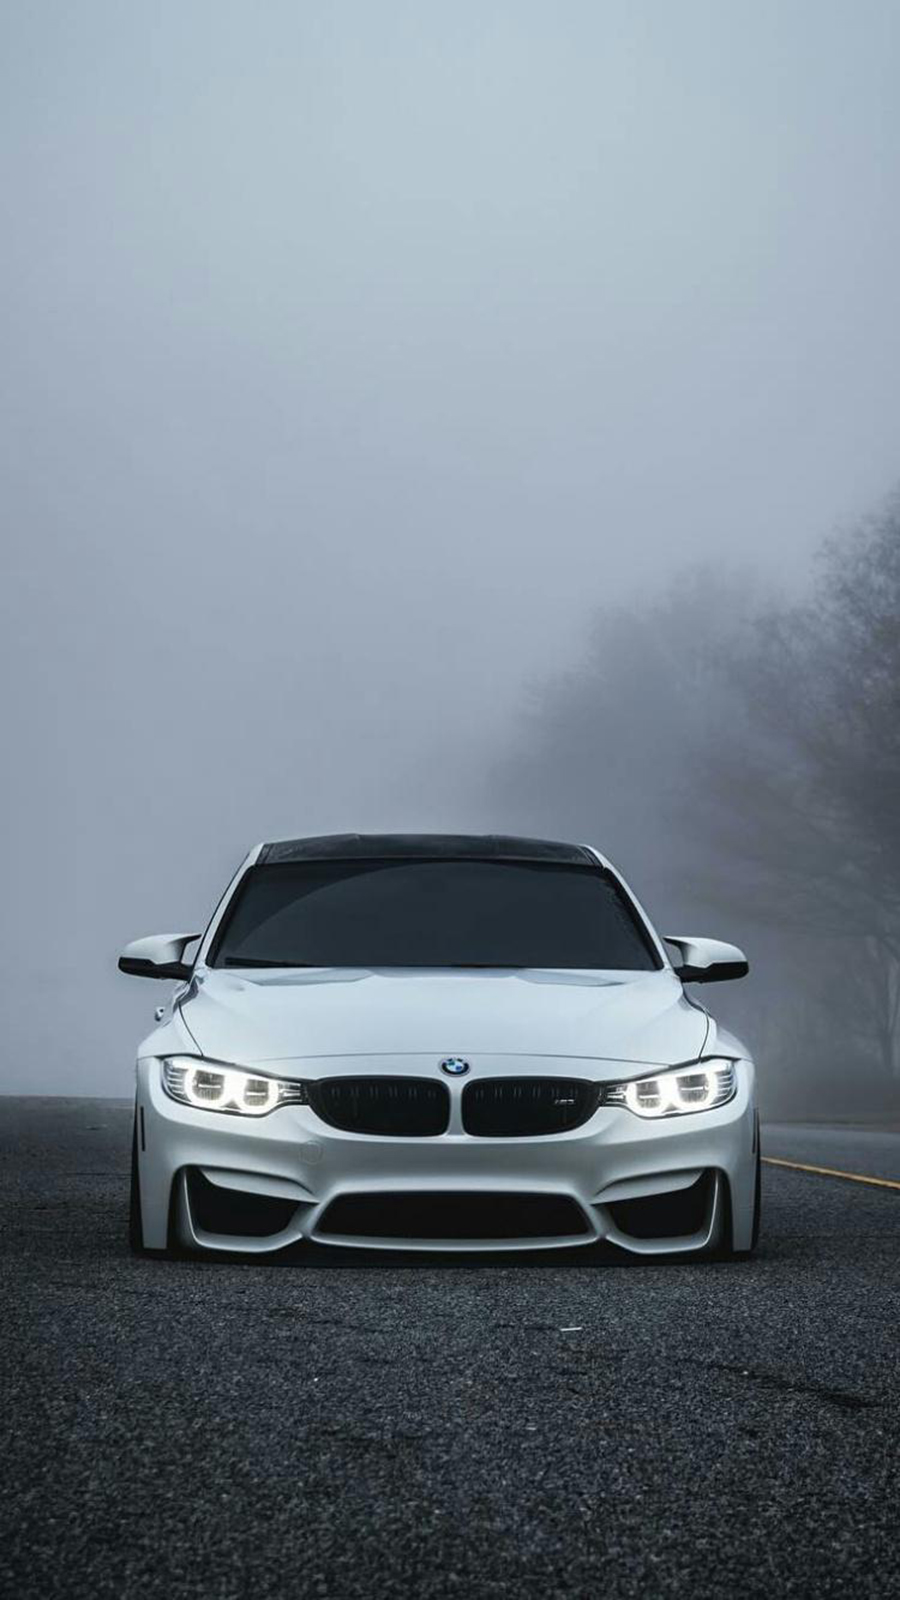 Bmw HD Wallpaper – Most Popular BMW Wallpapers Free Download